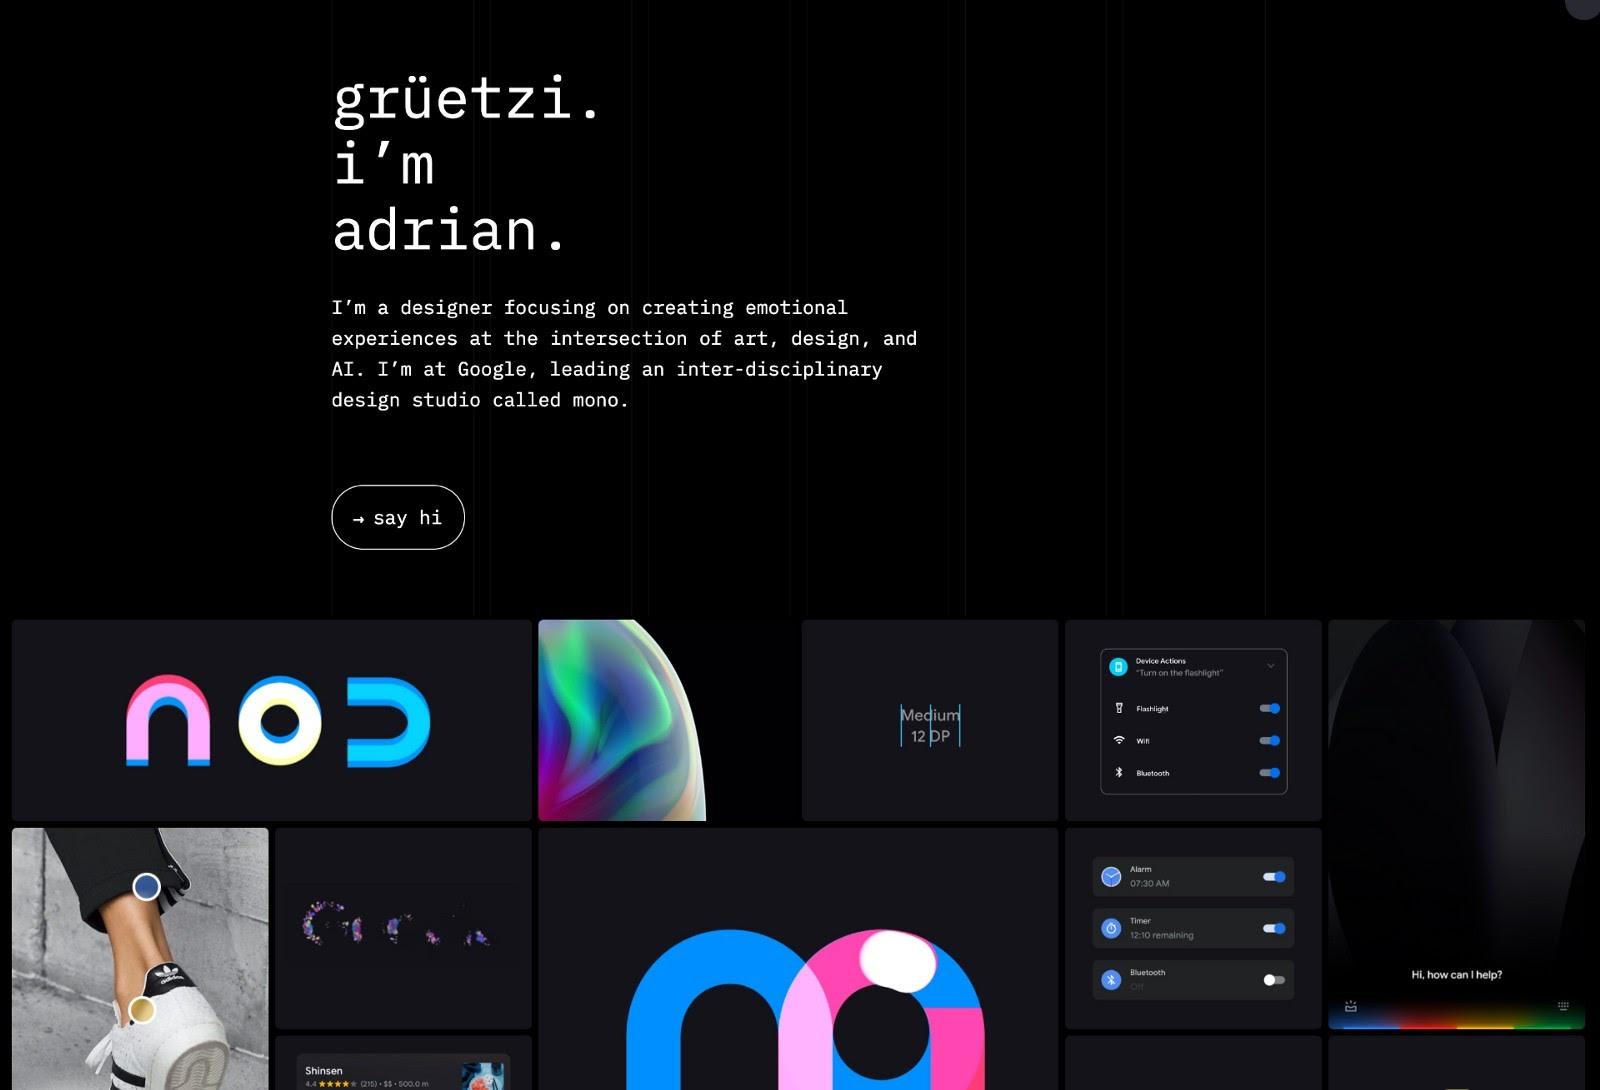 Web design portfolio example (source: Adrian Z)